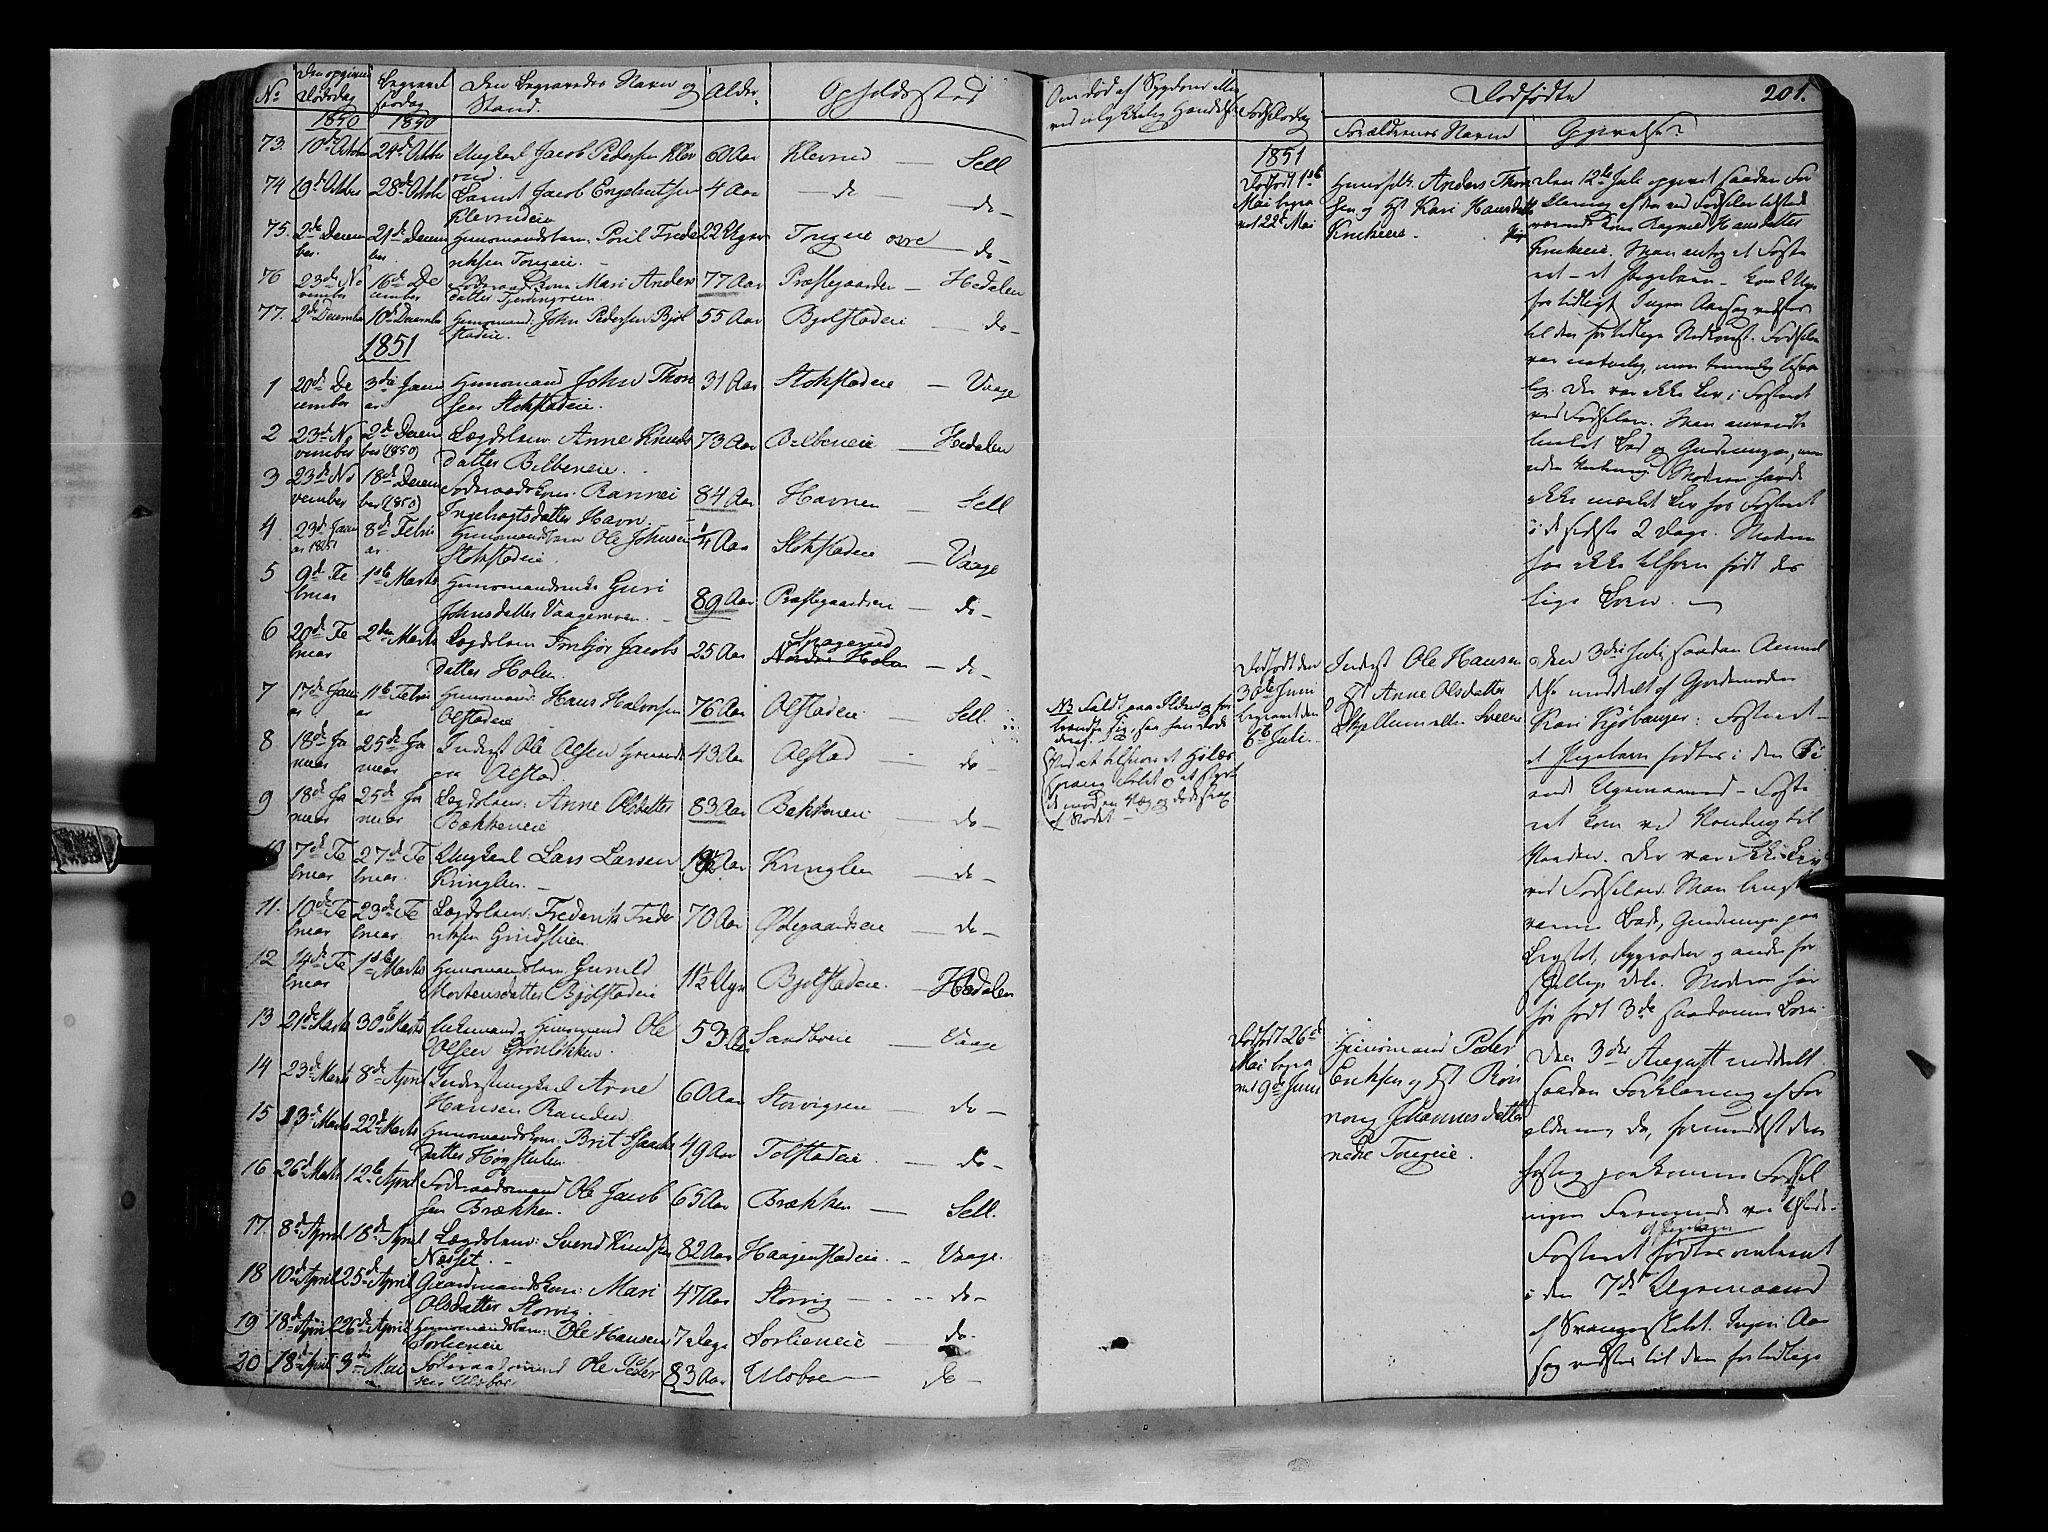 SAH, Vågå prestekontor, Ministerialbok nr. 5 /1, 1842-1856, s. 201